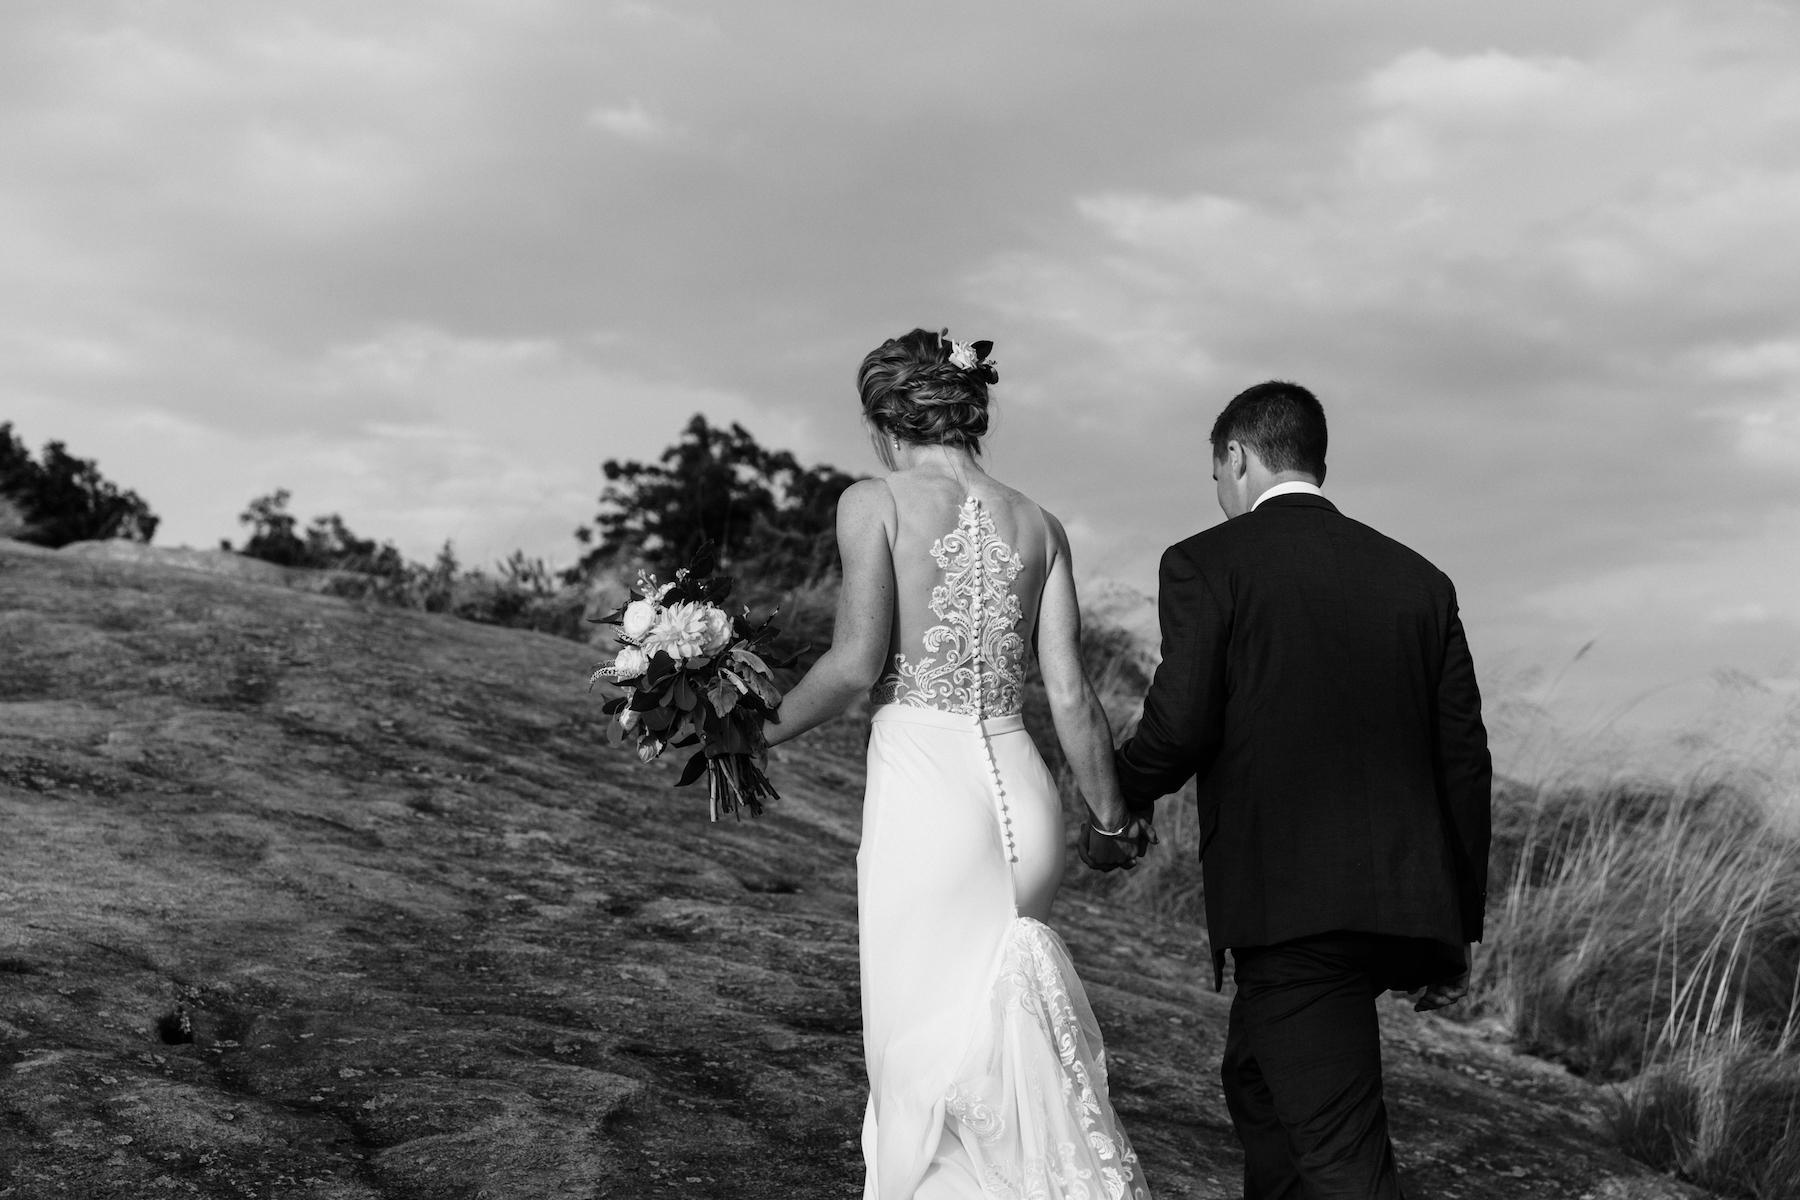 wedding-engagement-photographer-spartanburg-greenville-columbia-carolina-south-north-521.JPG